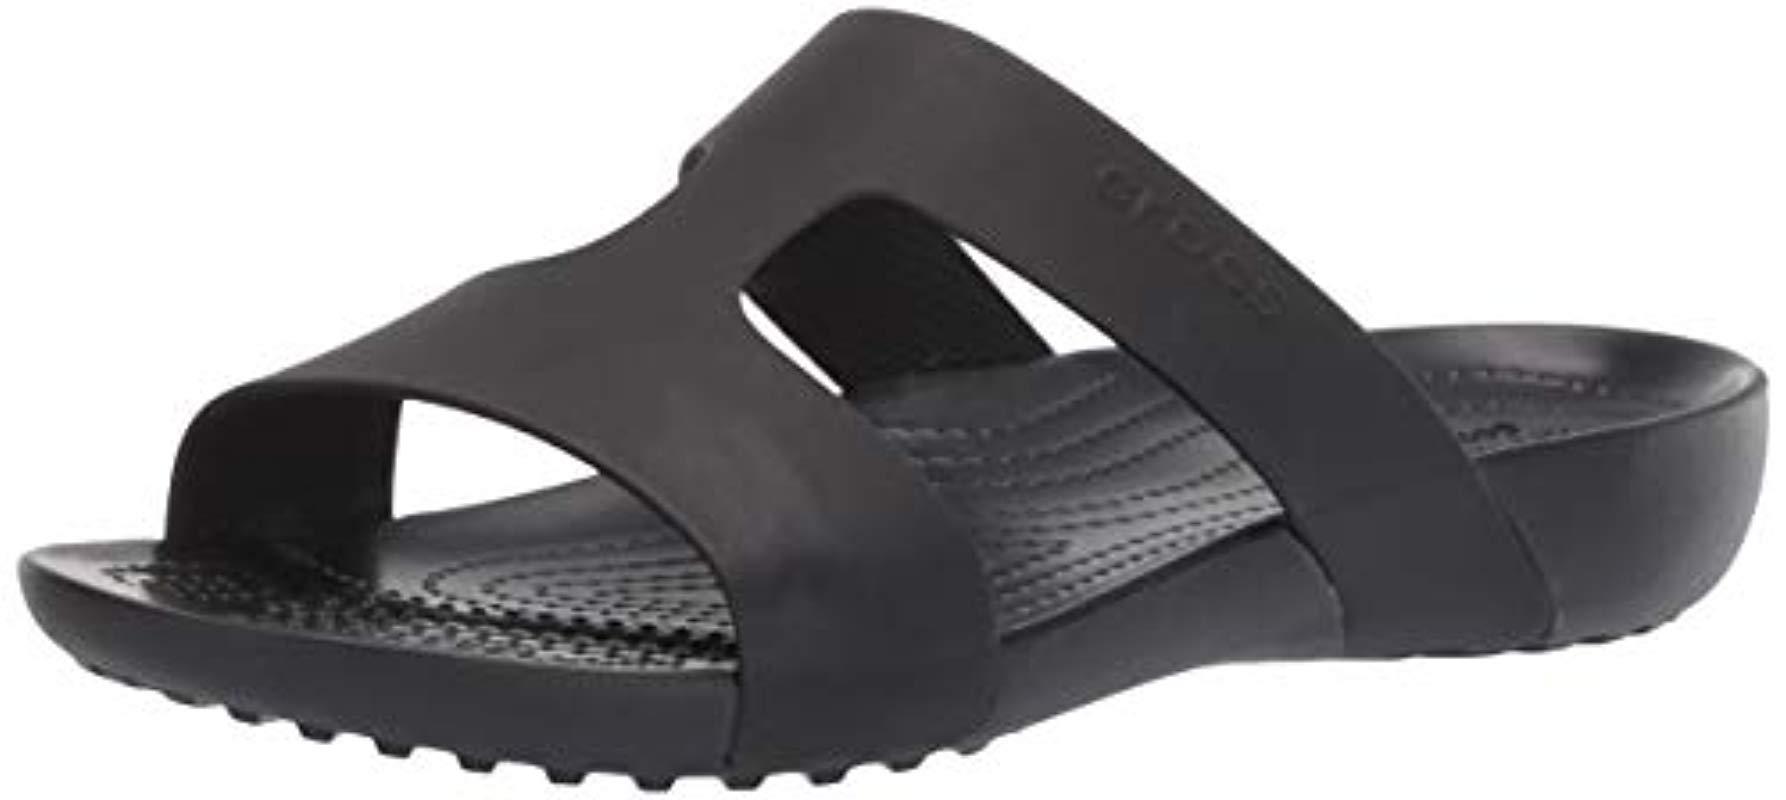 fd0c64487c89b Crocs™ Serena Slide W Heels Sandals in Black - Lyst